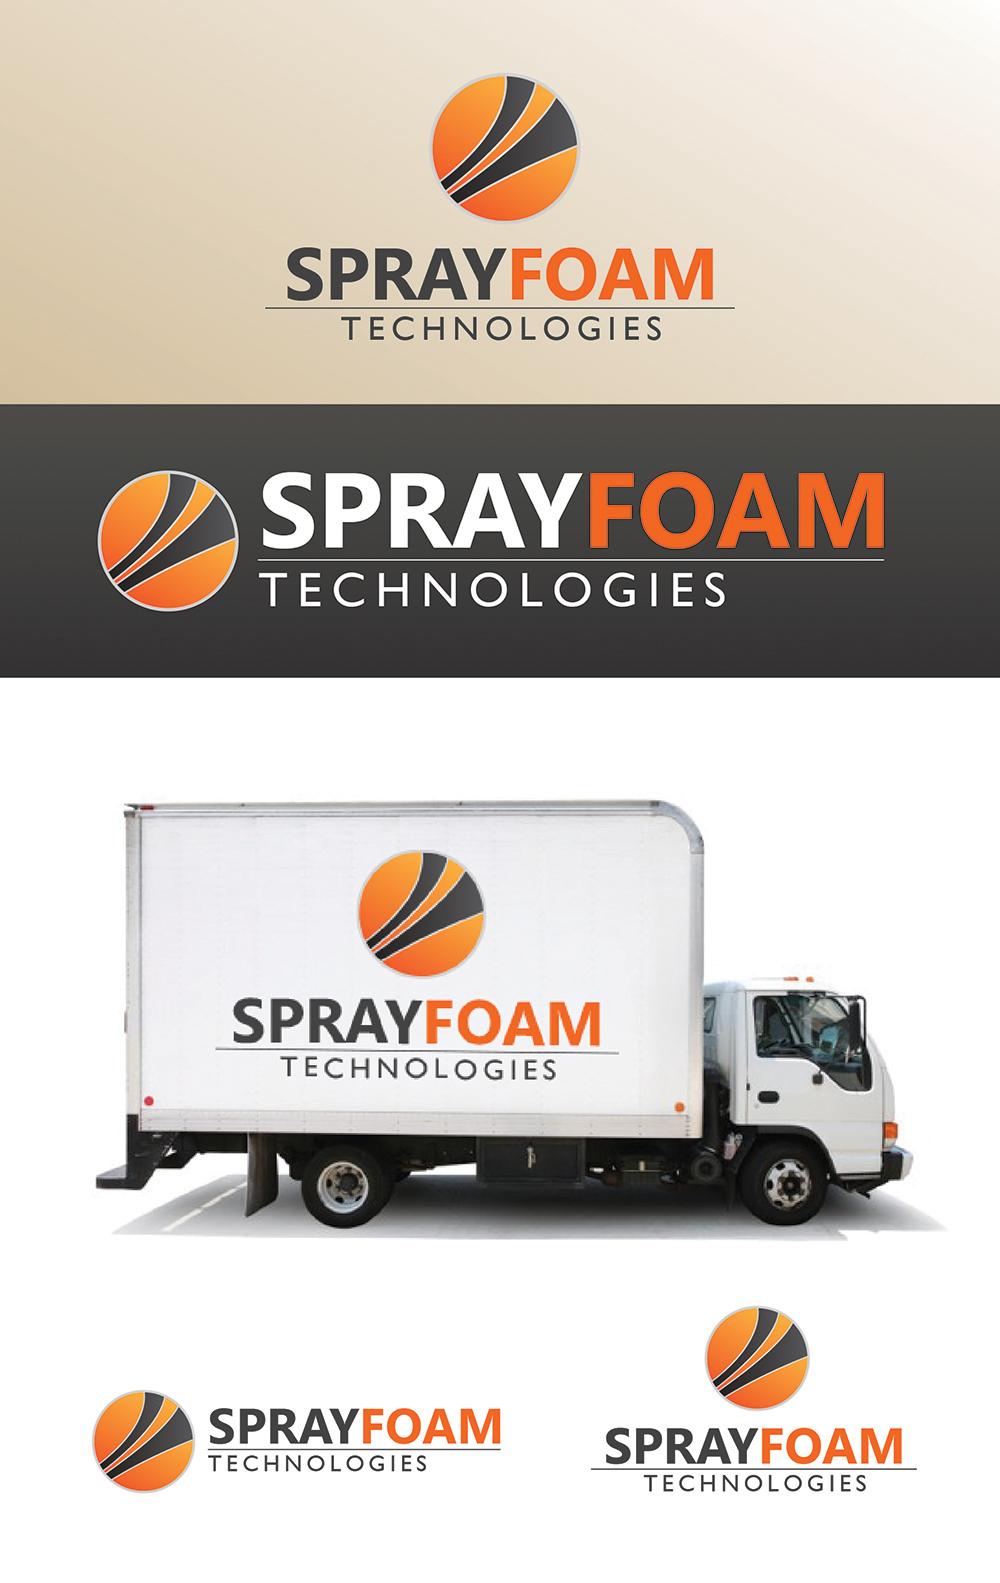 Sprayfoam_Tech.jpg